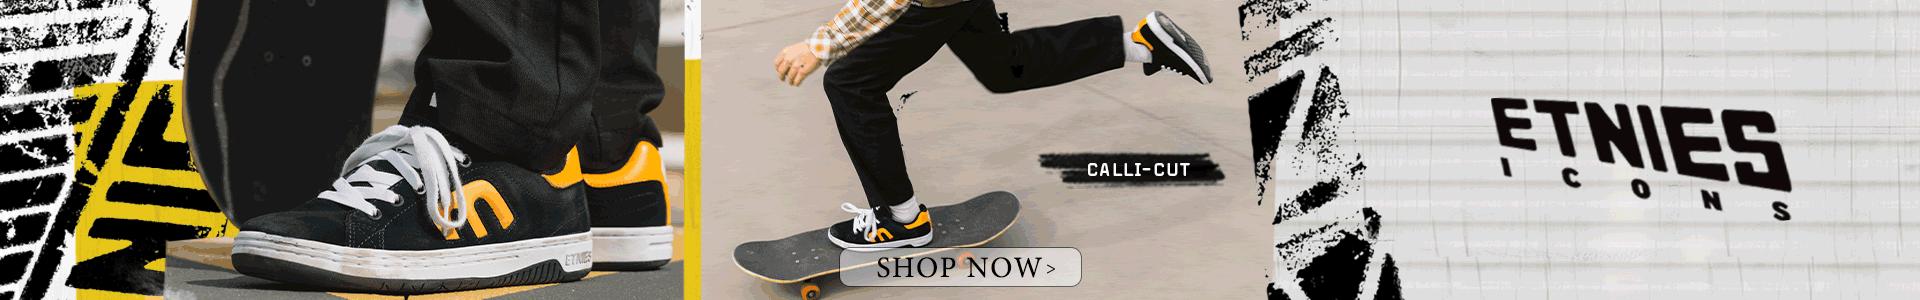 Shop Etnies Callicut